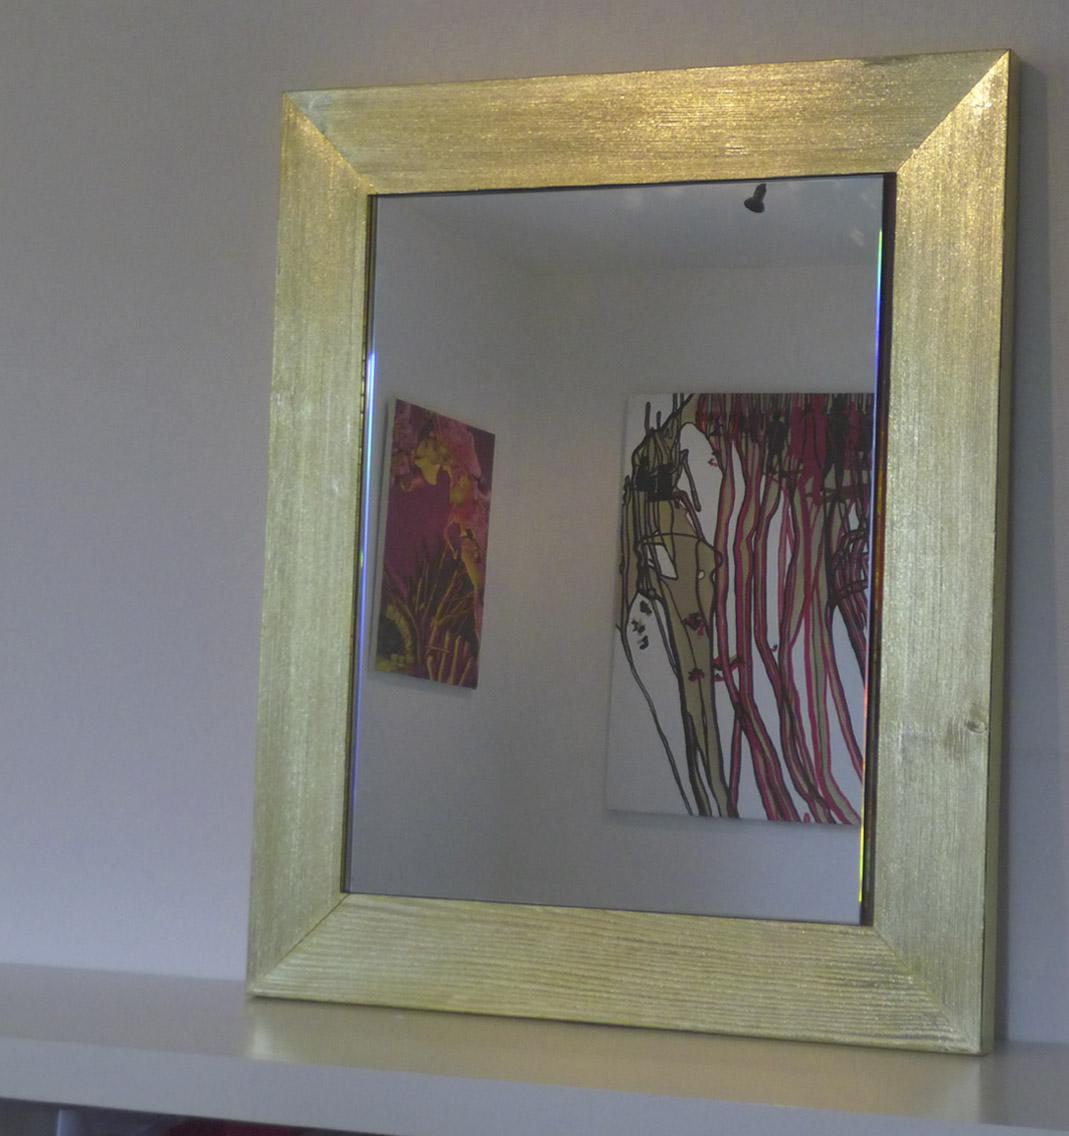 Miroir starck caadre fiam italia miroir idees fr for Miroir caadre philippe starck